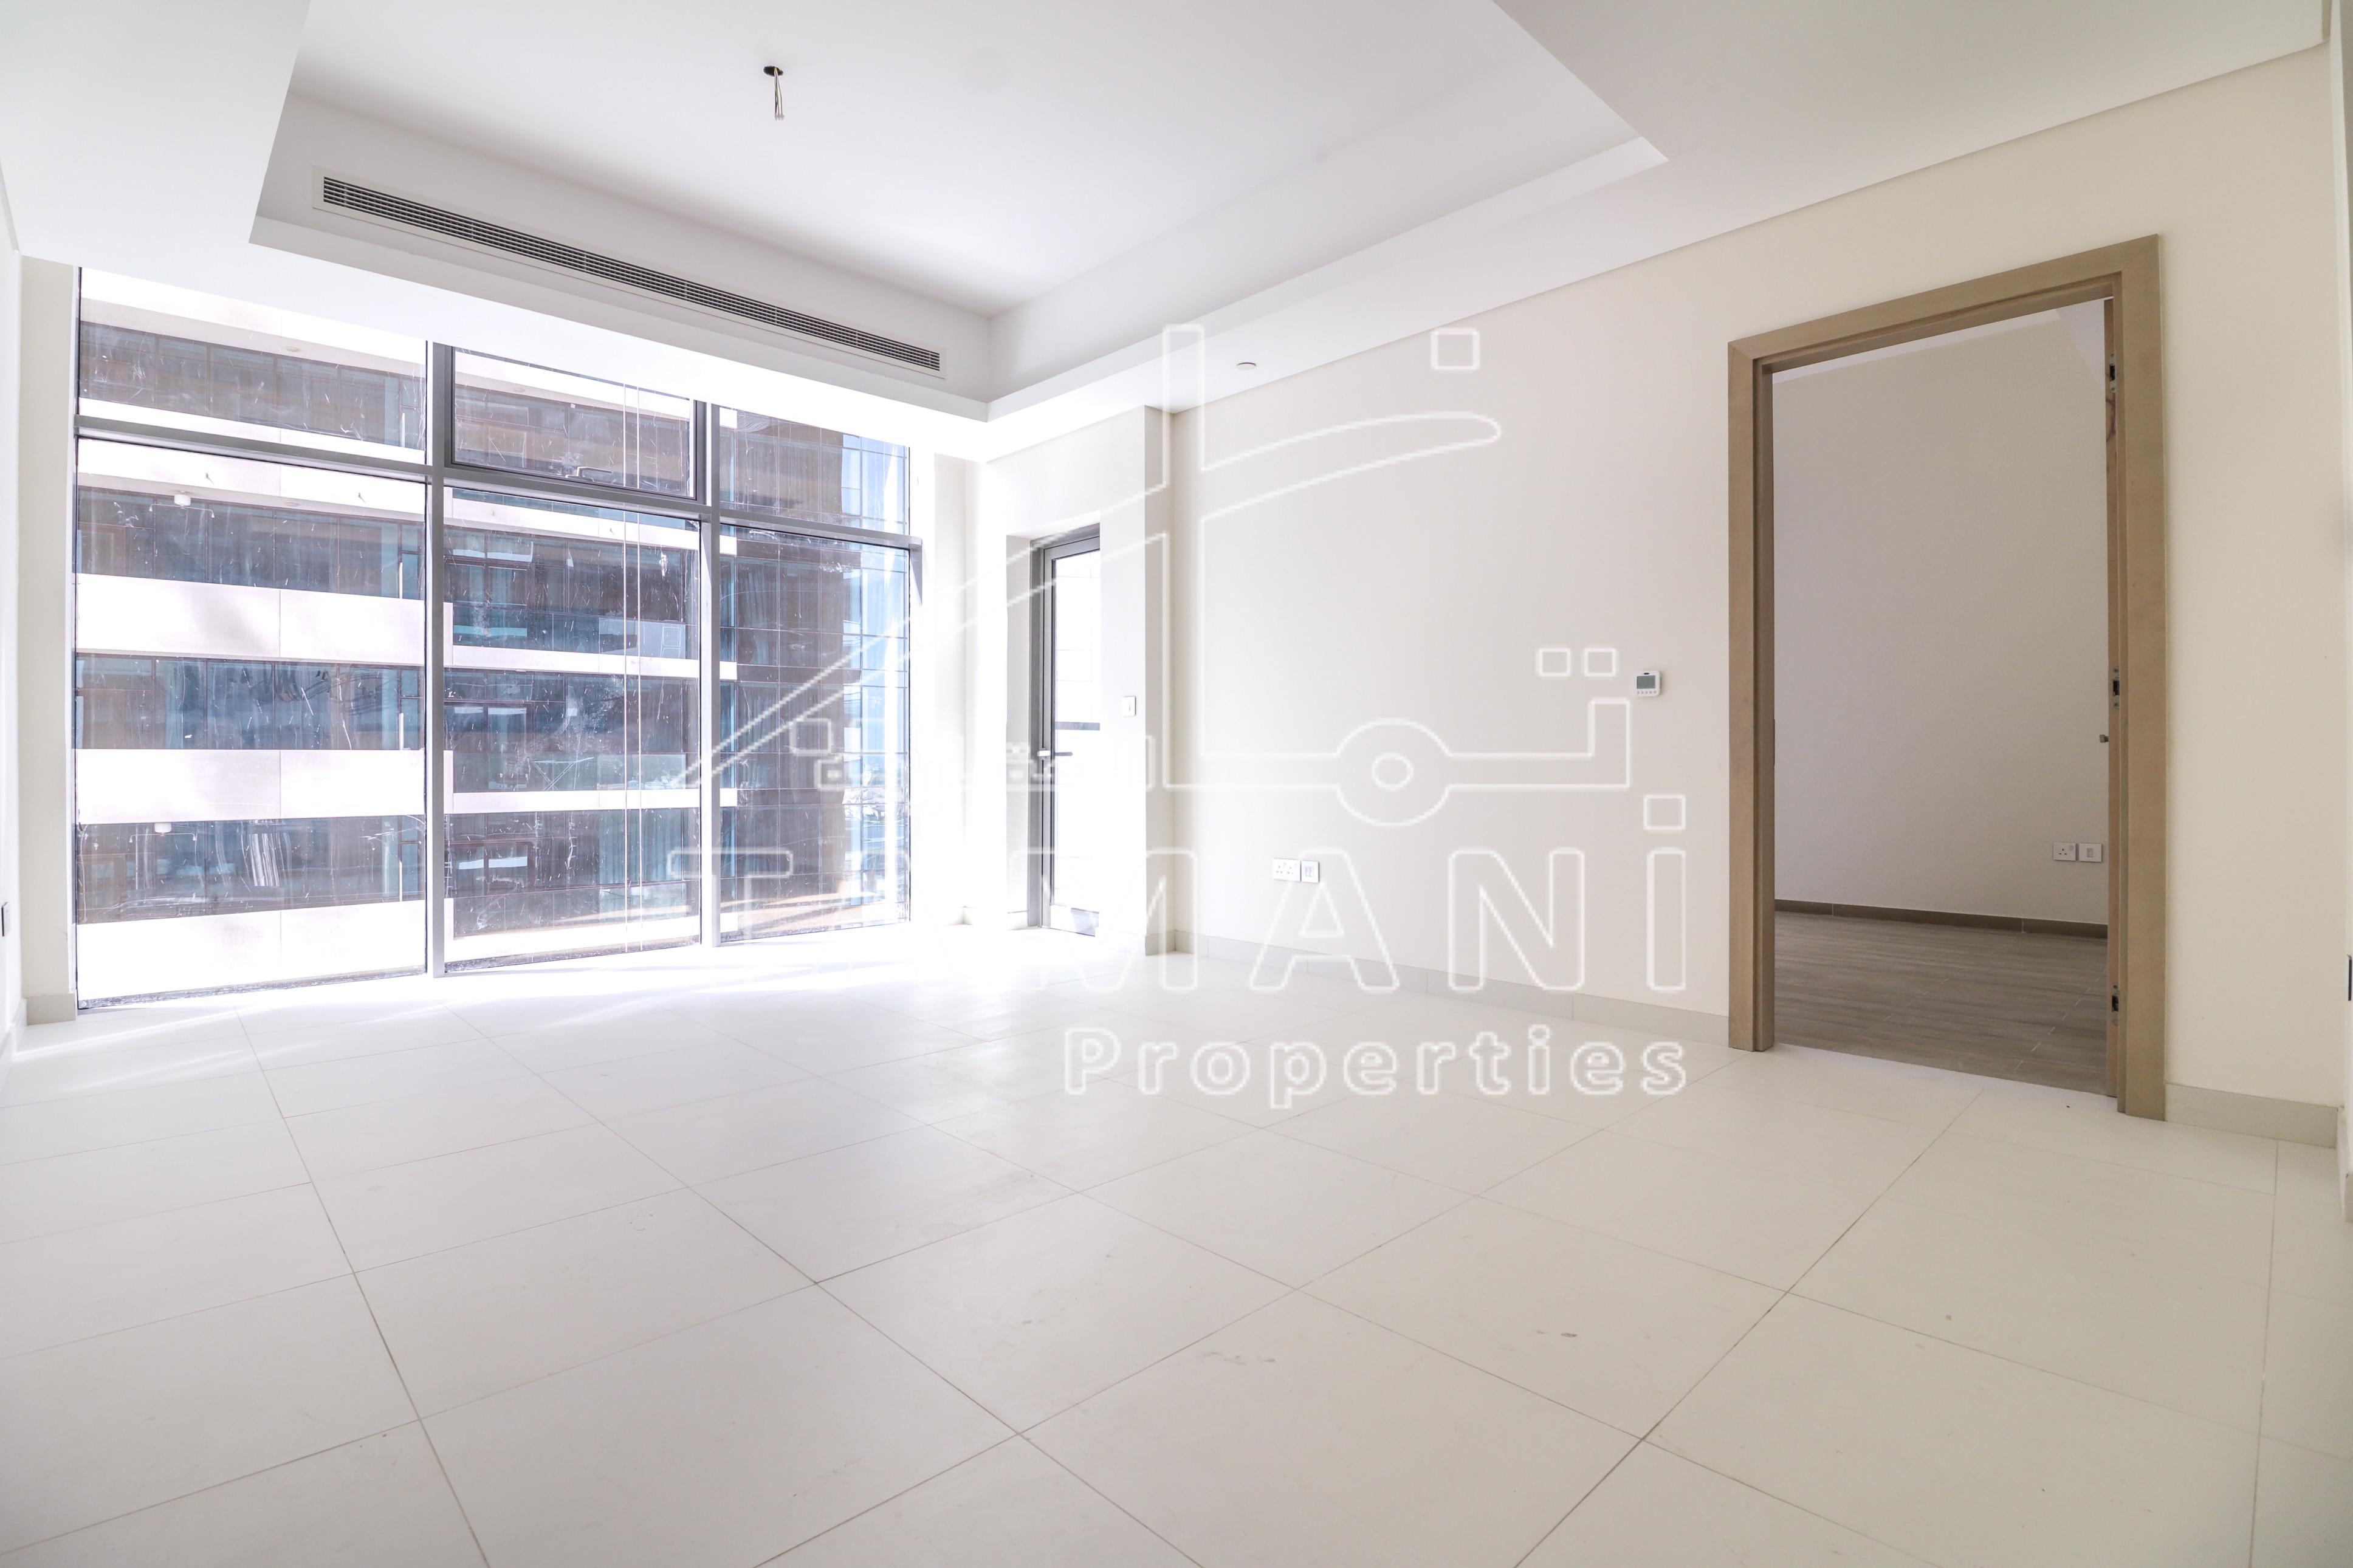 New 1 Bedroom w/ Balcony and Kitchen App - Mada Residences by ARTAR